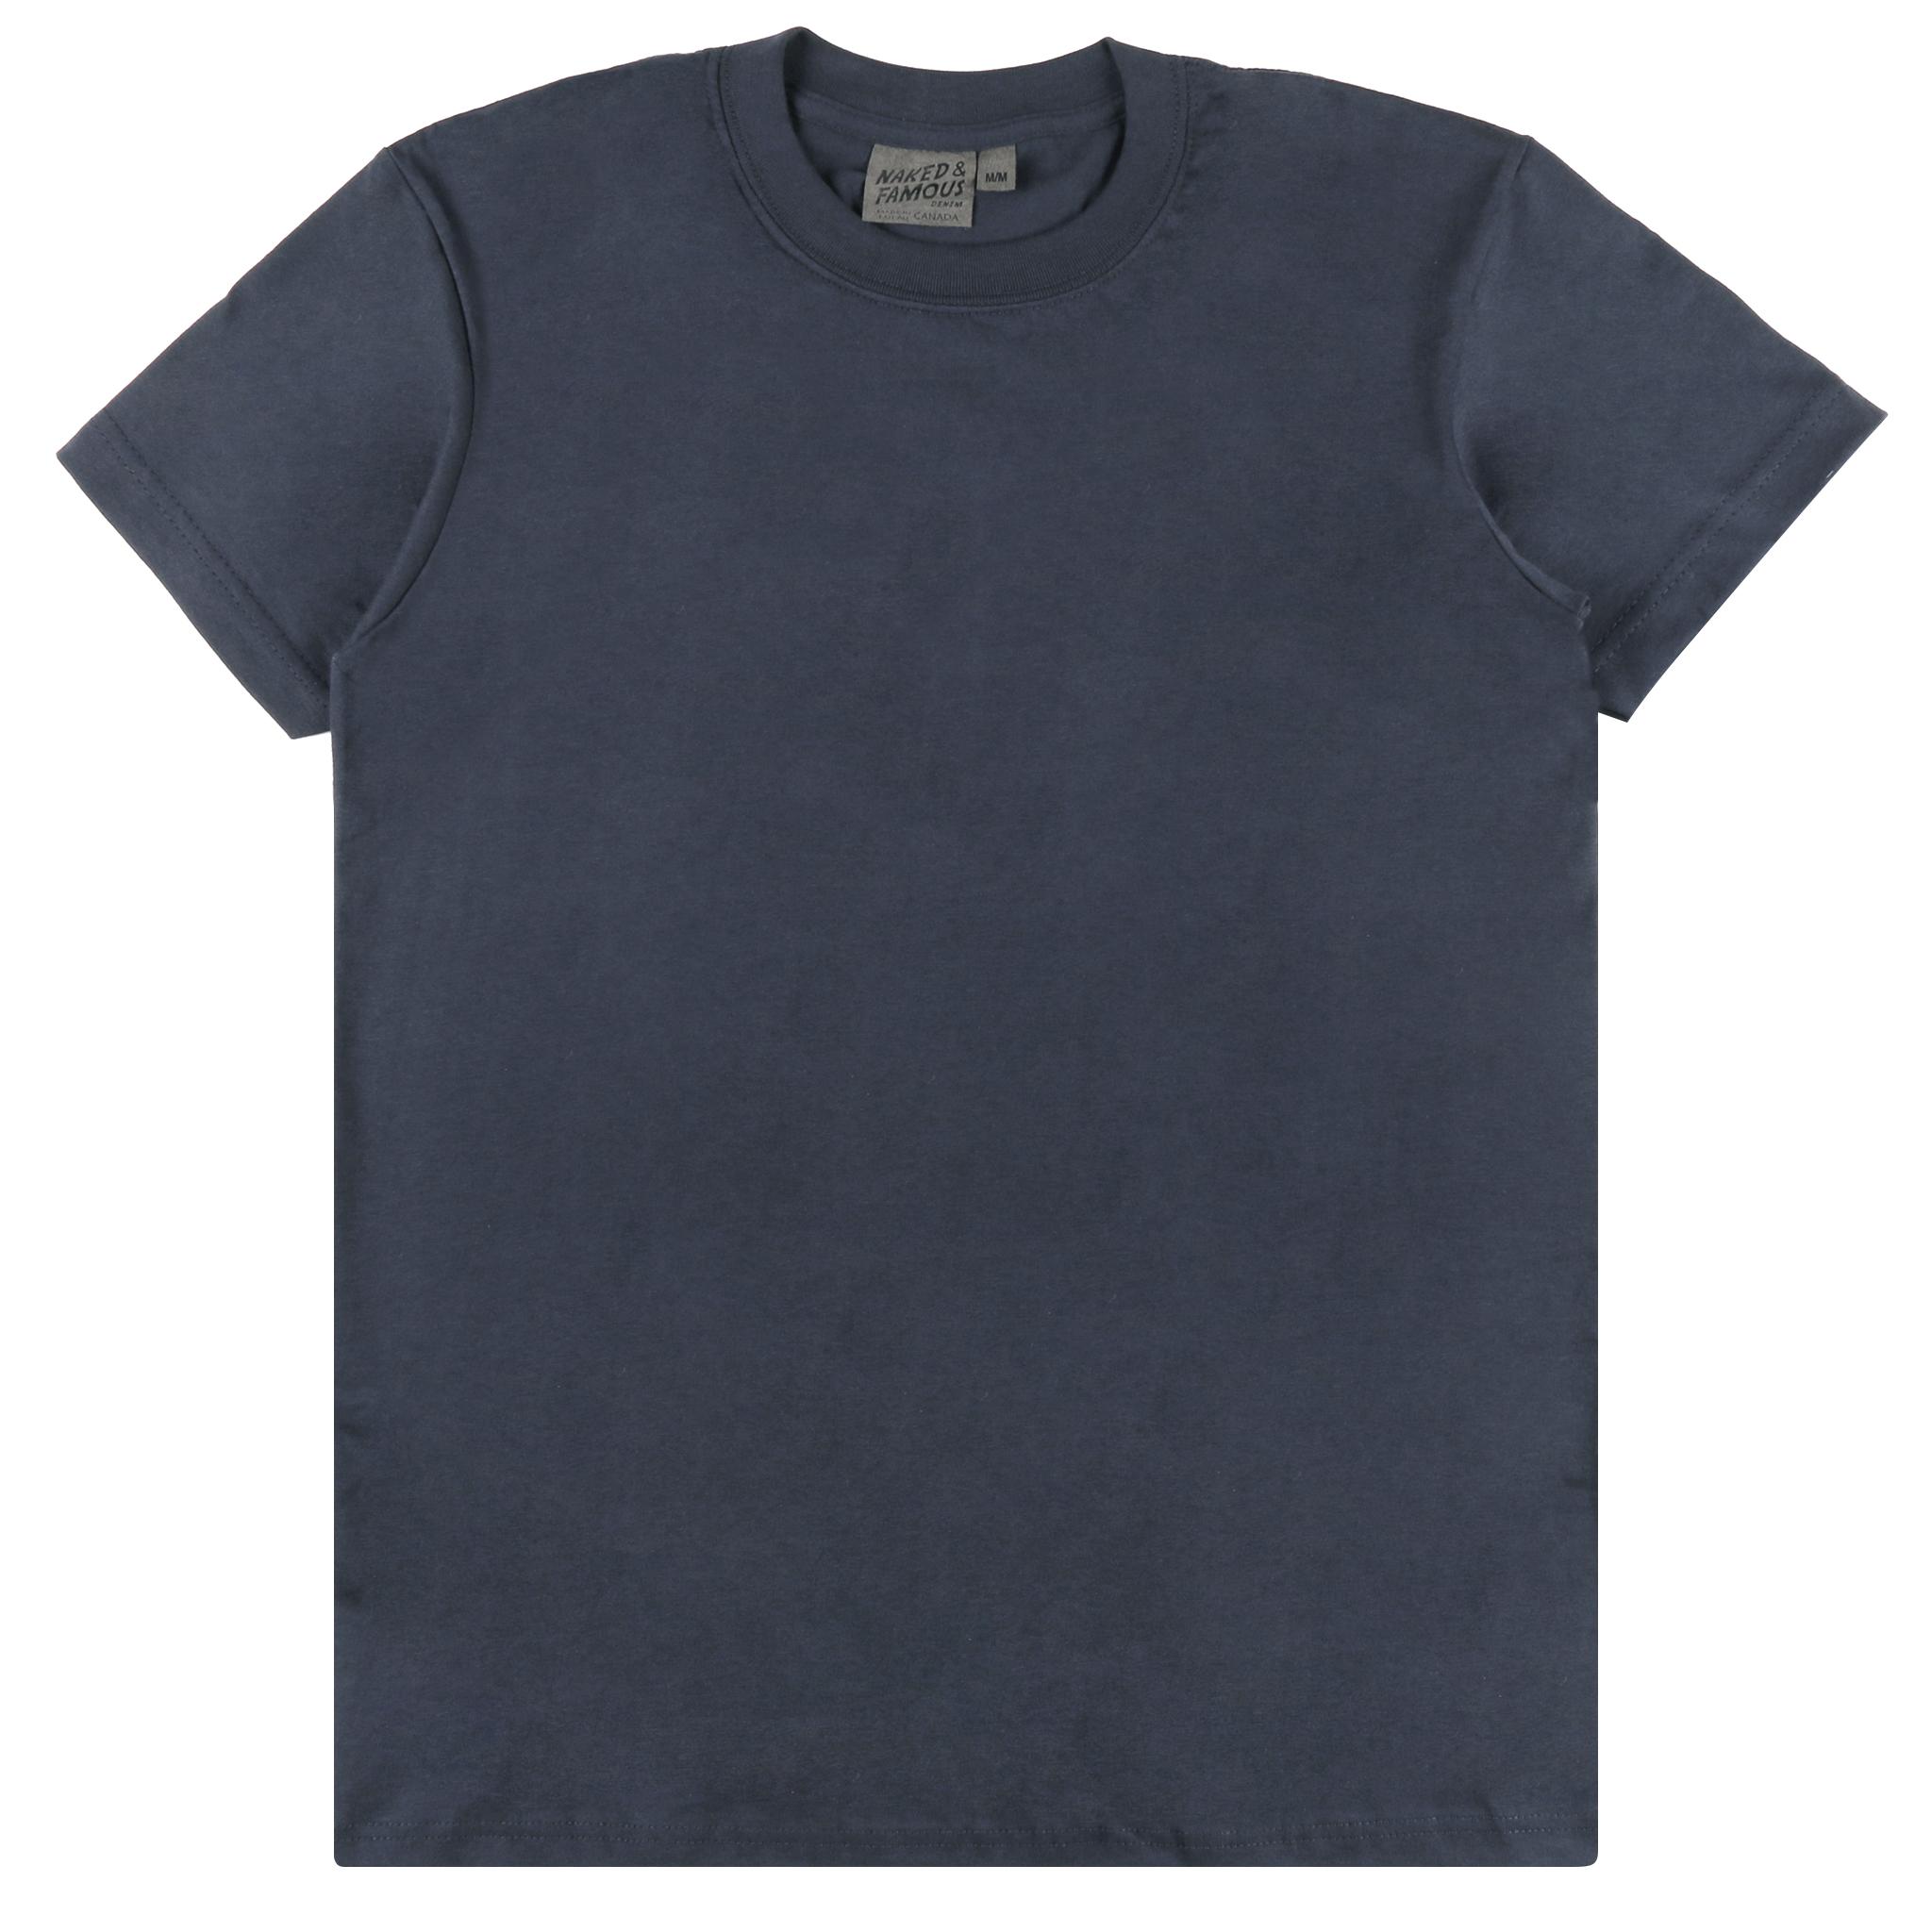 NAVY RINGSPUN COTTON - Circular T-Shirt